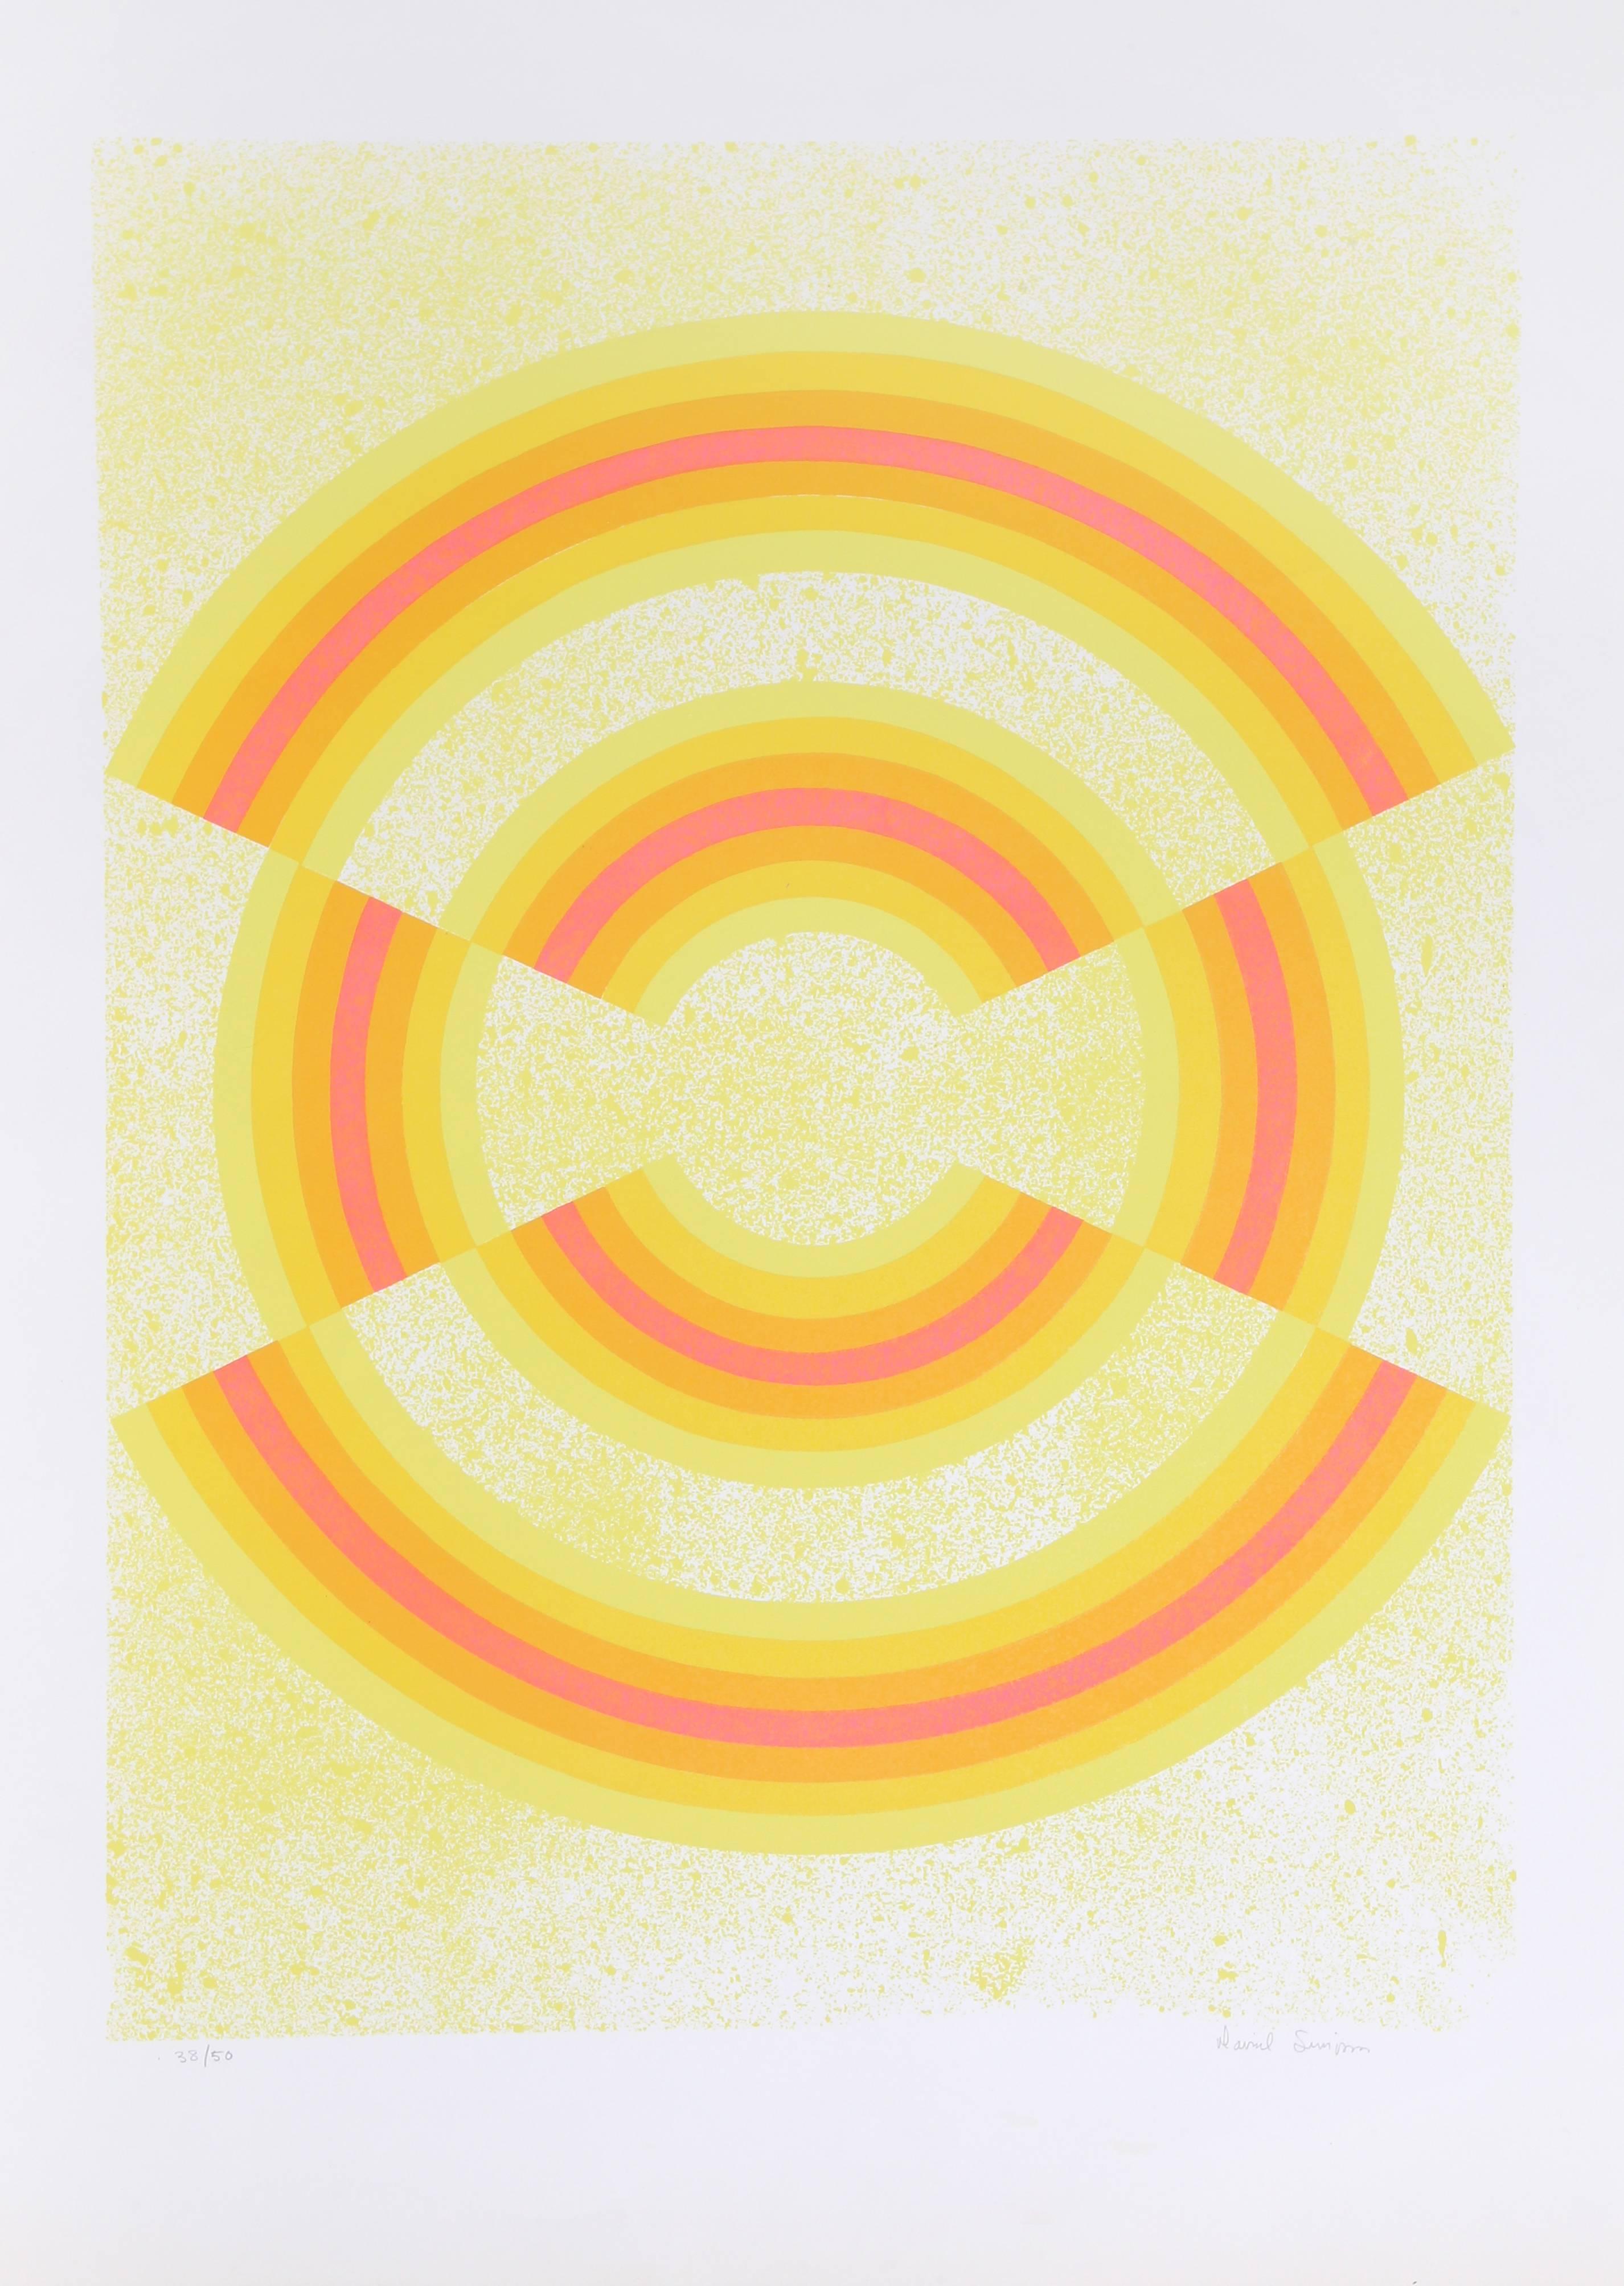 Ovograph, OP Art Serigraph by David Simpson